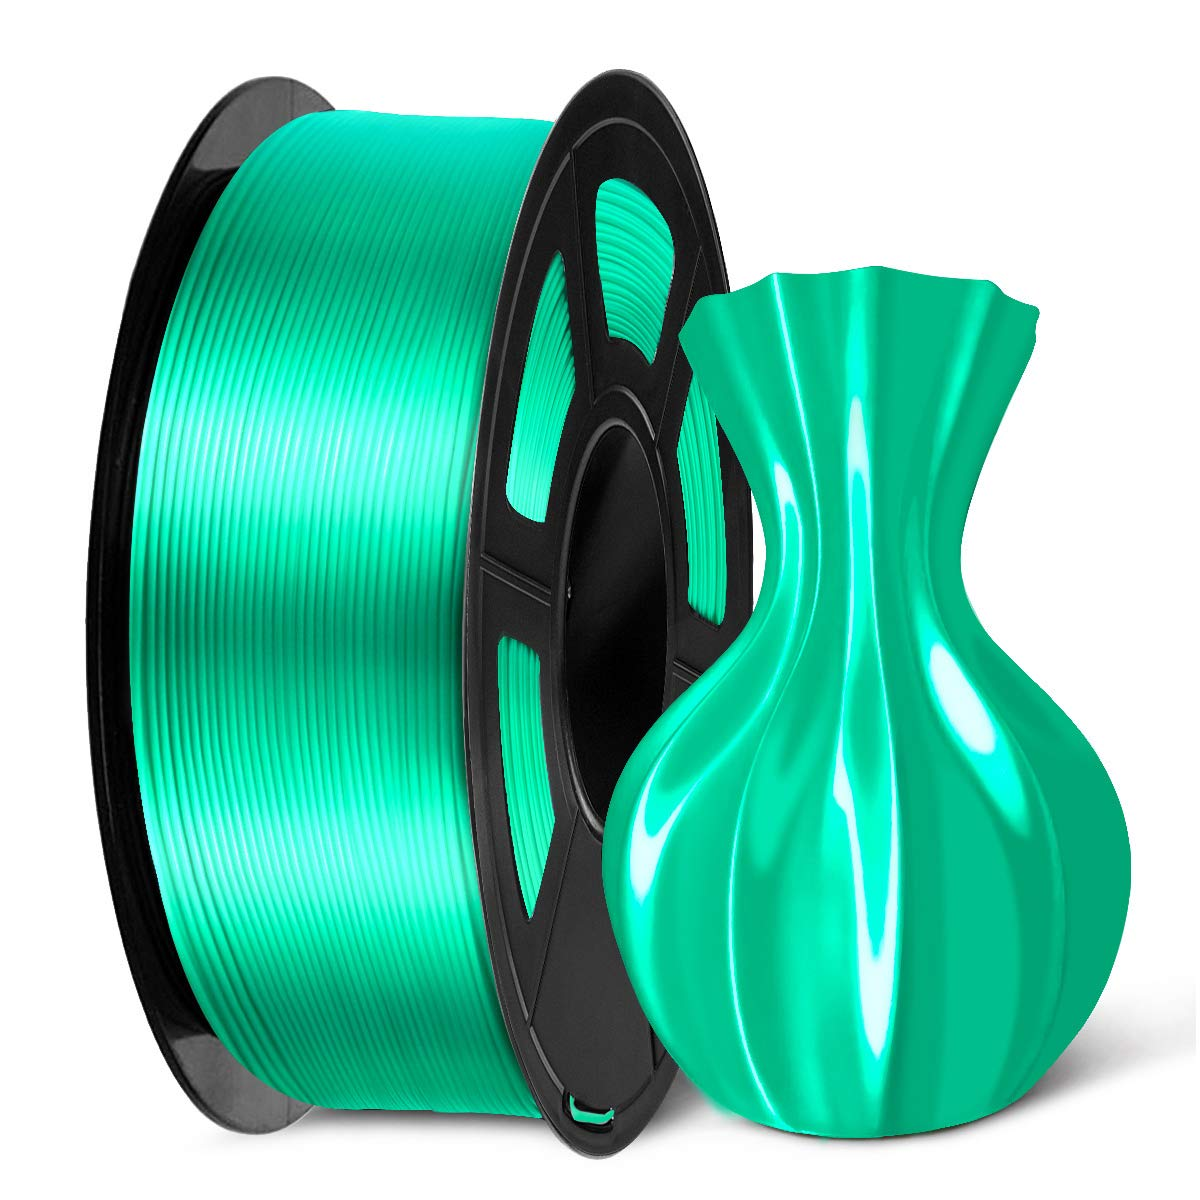 SUNLU PLA Silk Green Filament 1.75mm, 3D Printer Filament, Shiny Silk 1.75 PLA Filament, 1KG(2.2LBS)/Spool, Green Silk PLA